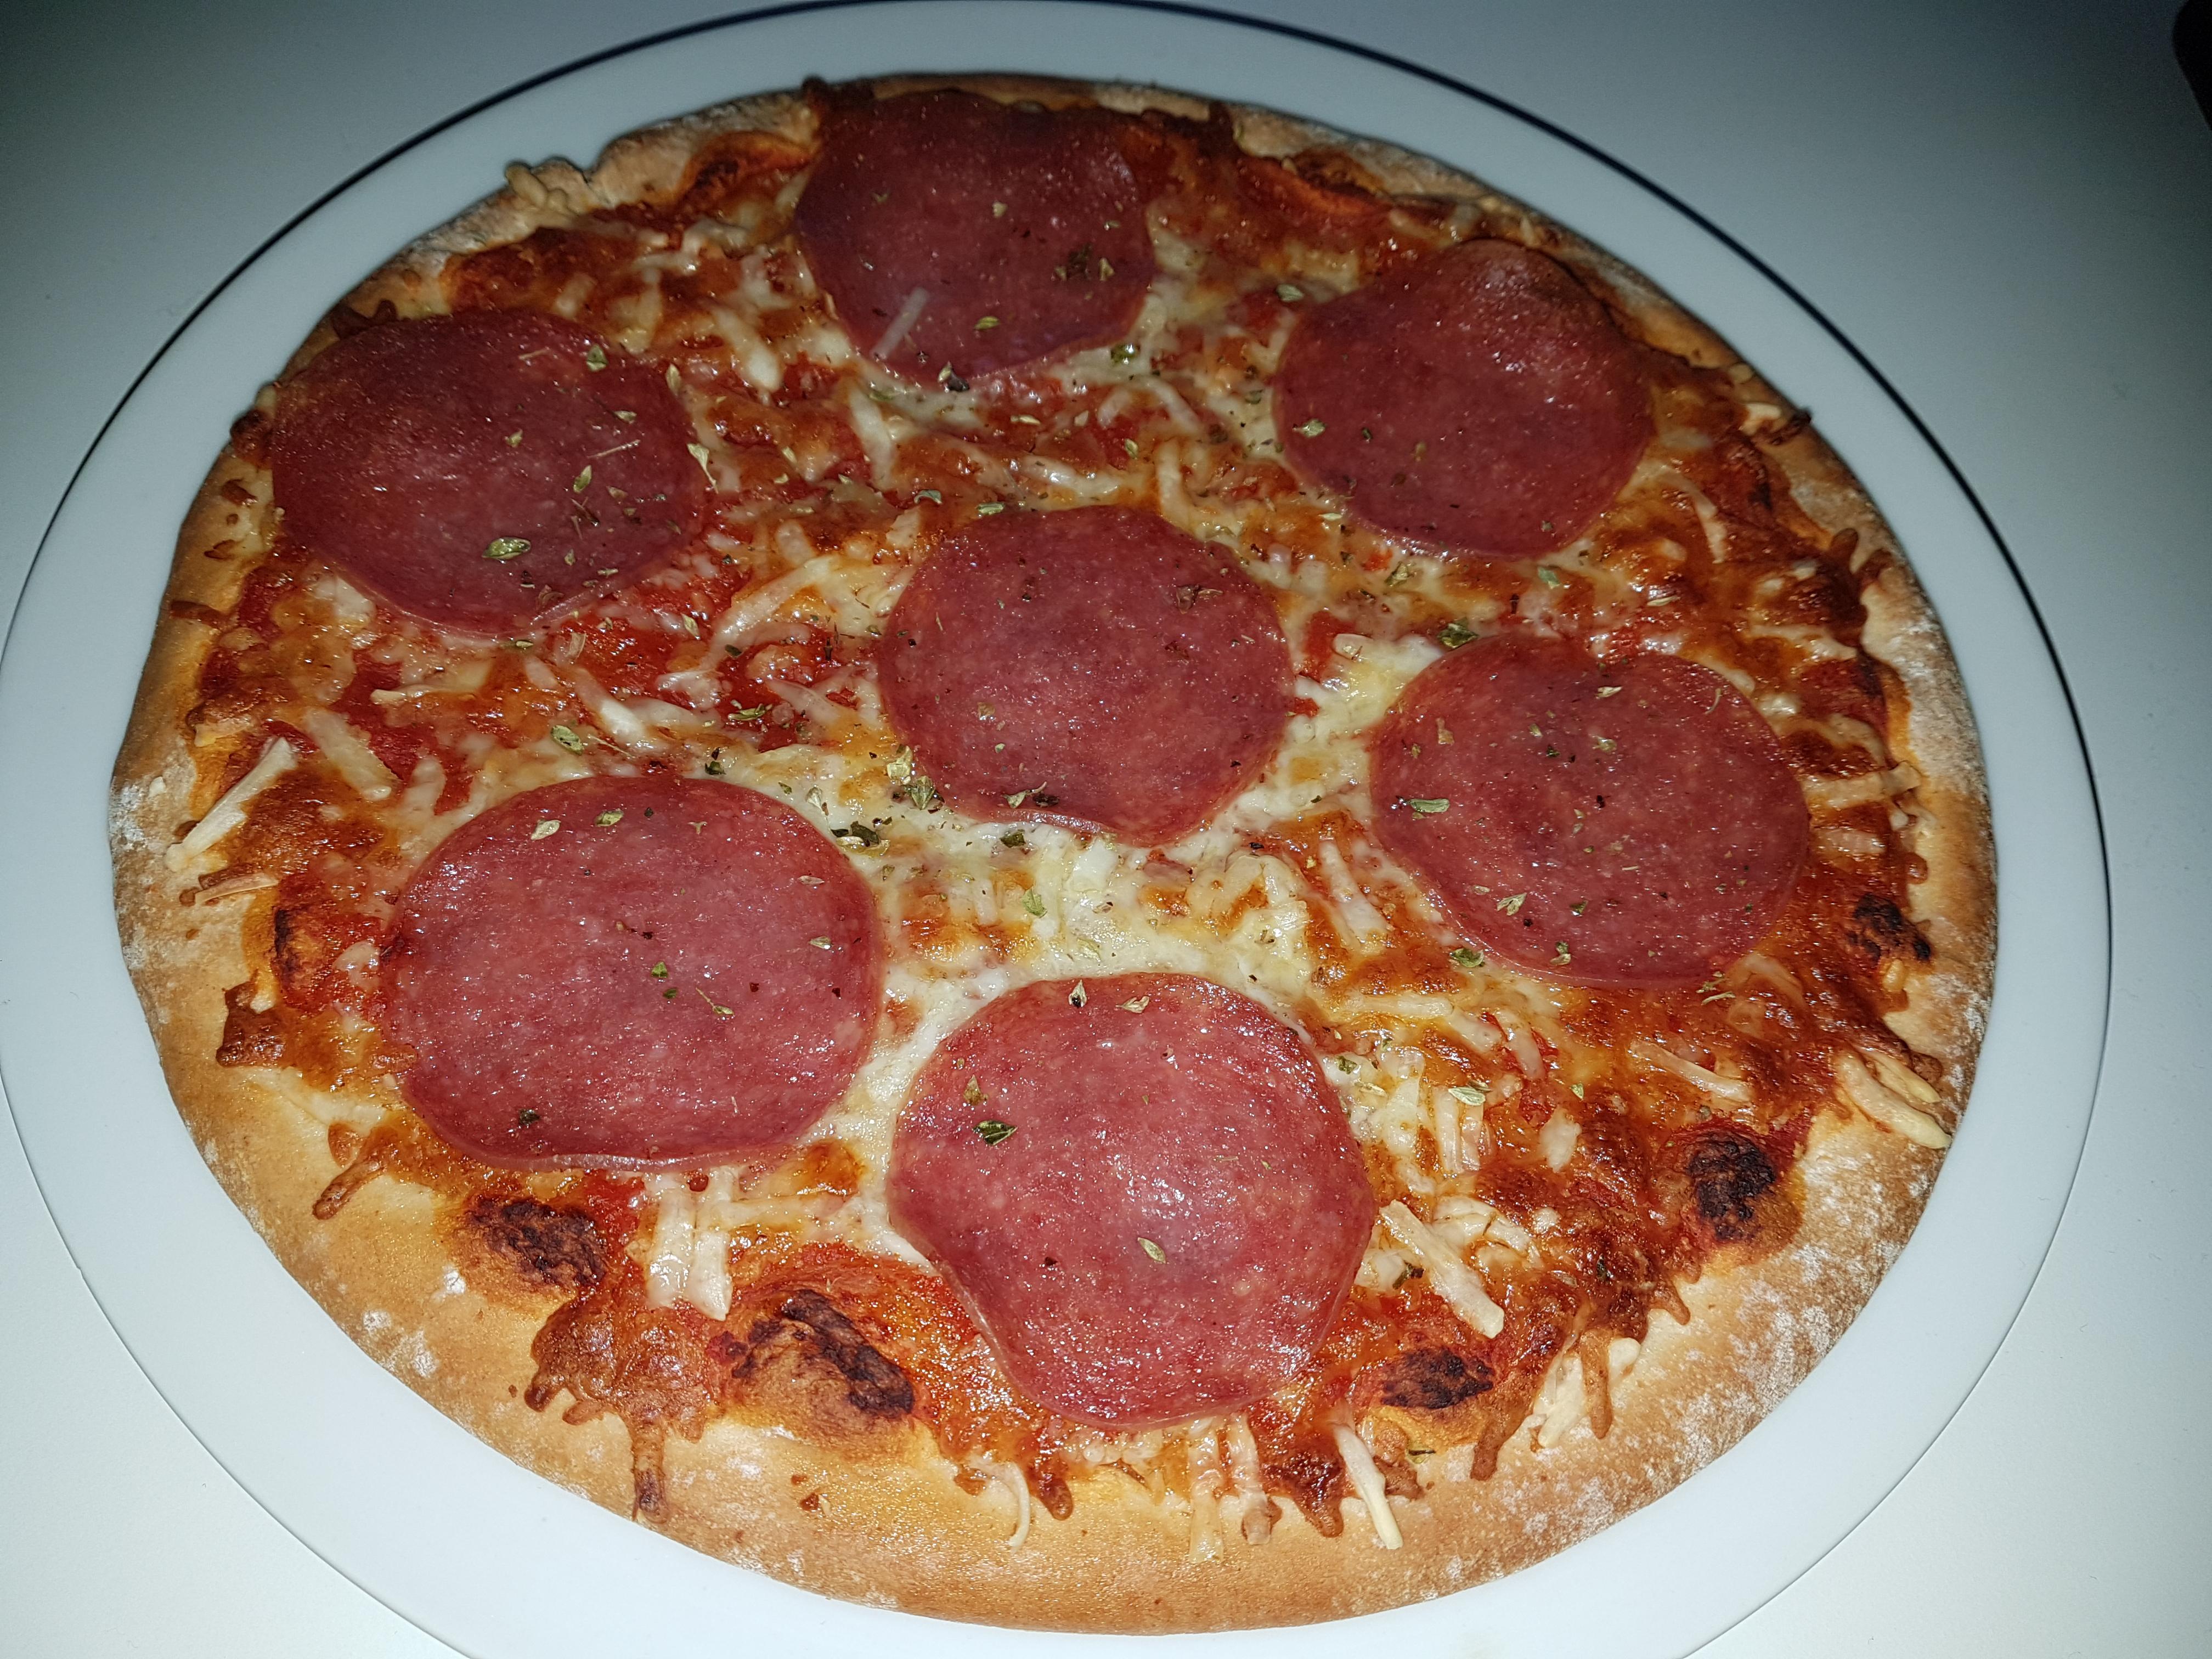 http://foodloader.net/Holz_2018-01-21_Pizza.jpg